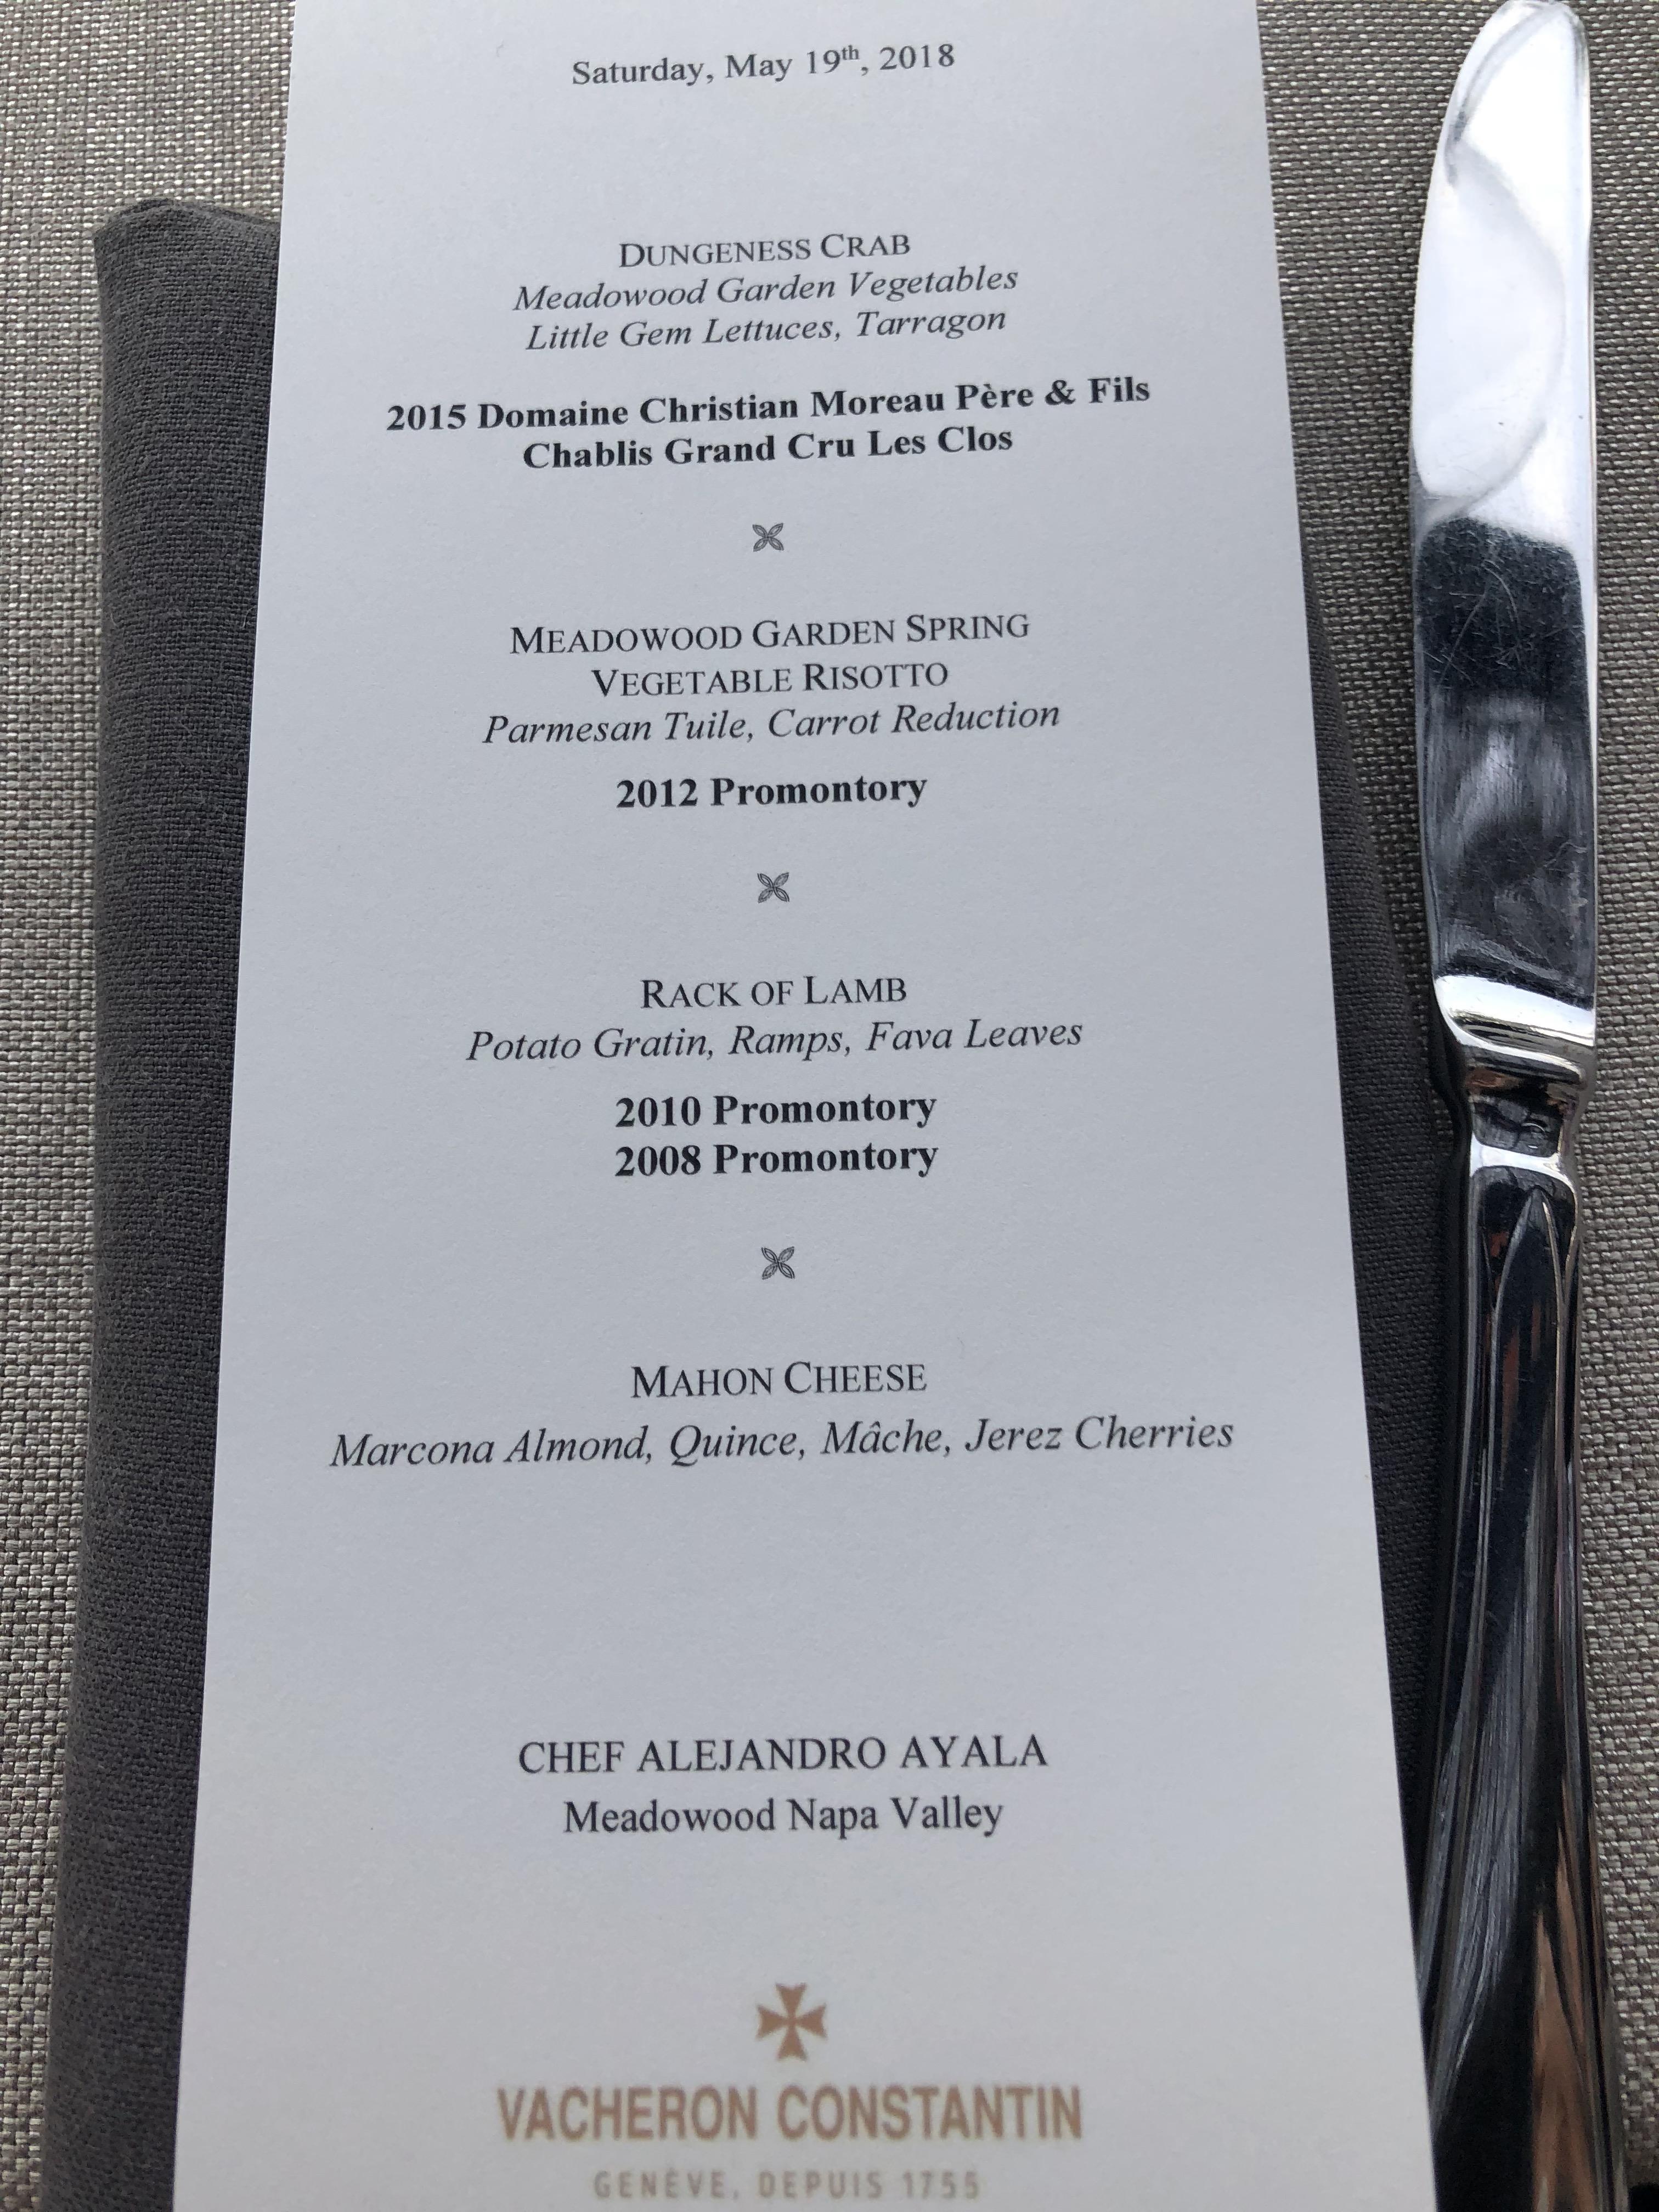 The Vacheron Constantin and Promontory menu